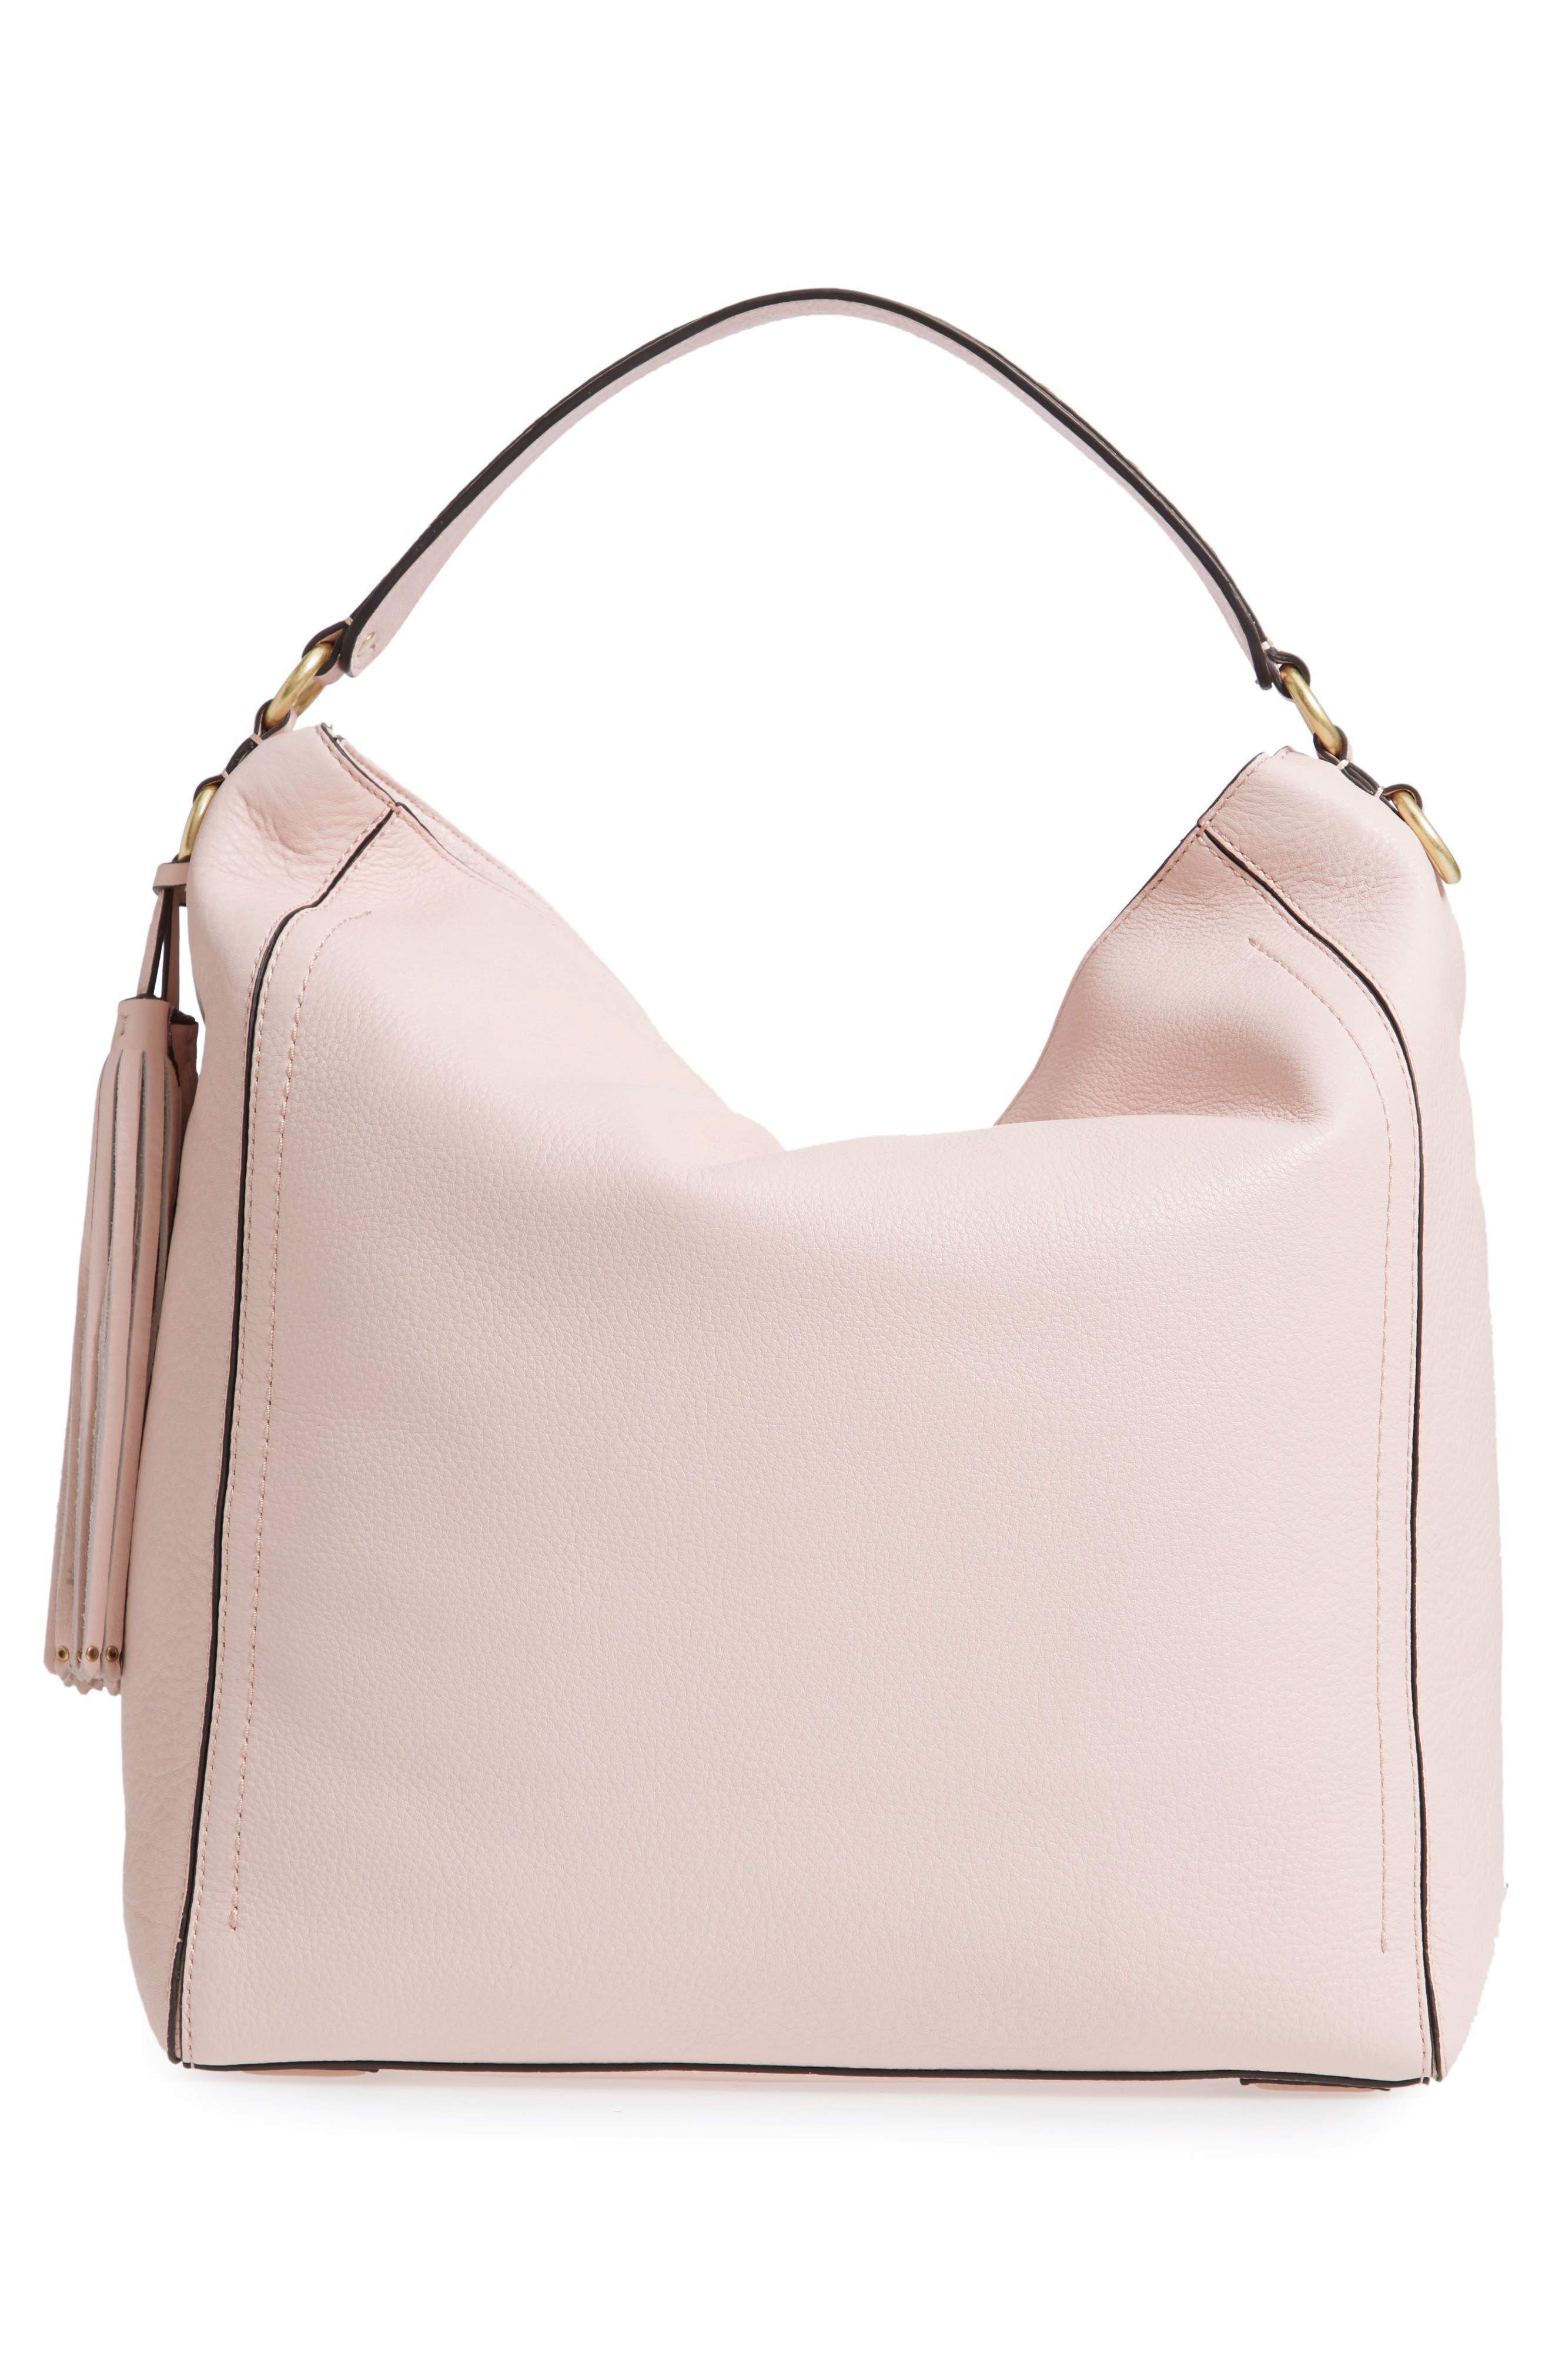 Cassidy RFID Pebbled Leather Bucket Bag,                             Alternate thumbnail 12, color,